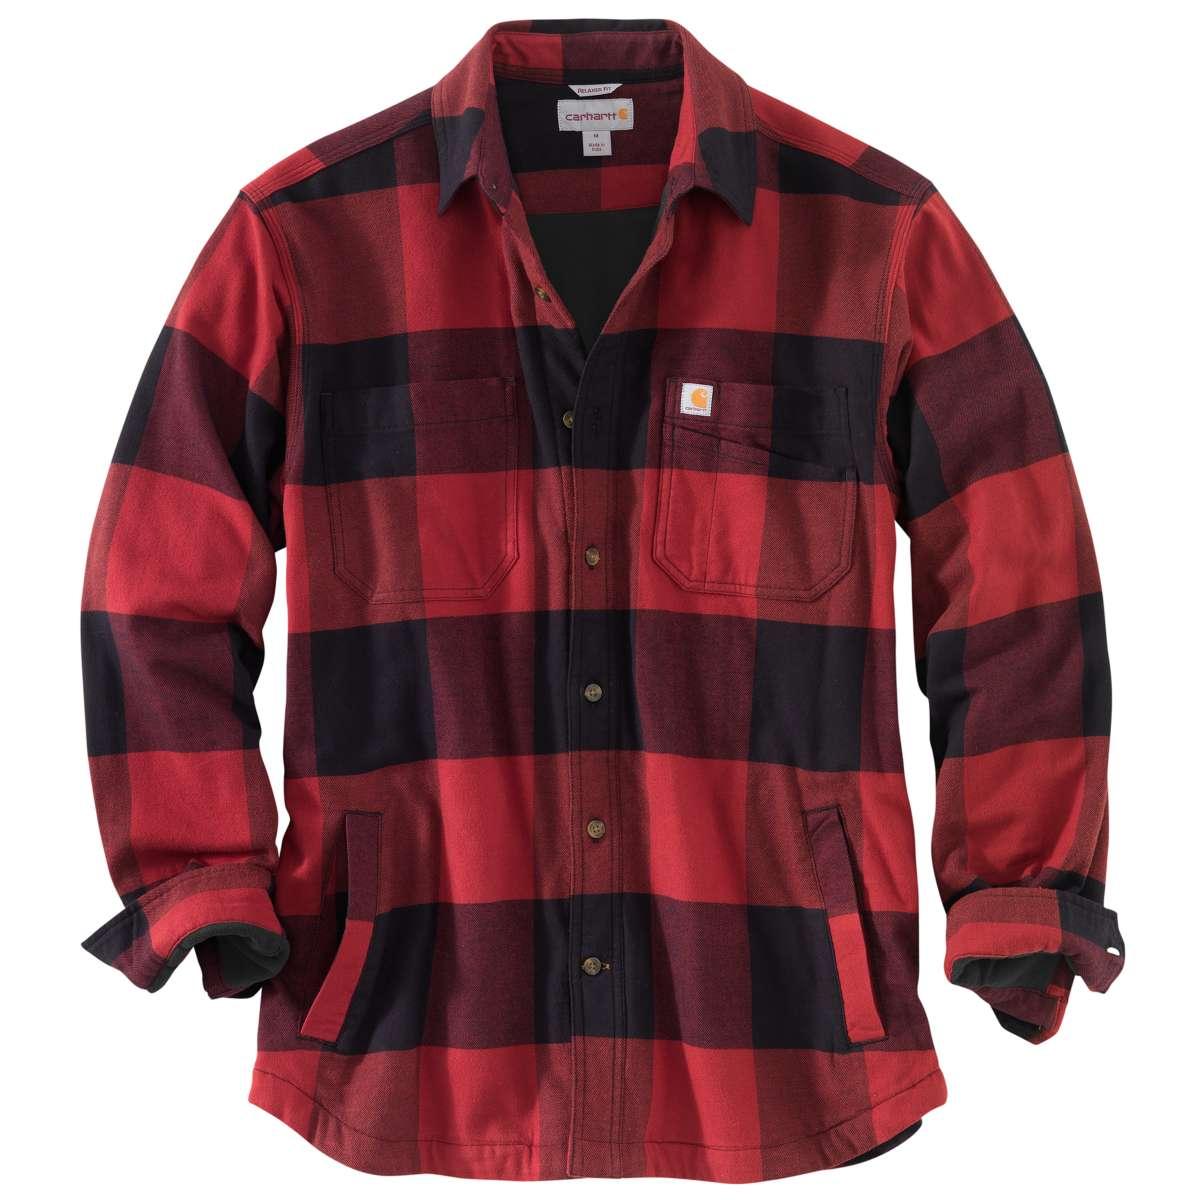 Carhartt Men's Rugged Flex Hamilton Fleece-Lined Shirt Jacket, Extended Sizes - Red, 3XL